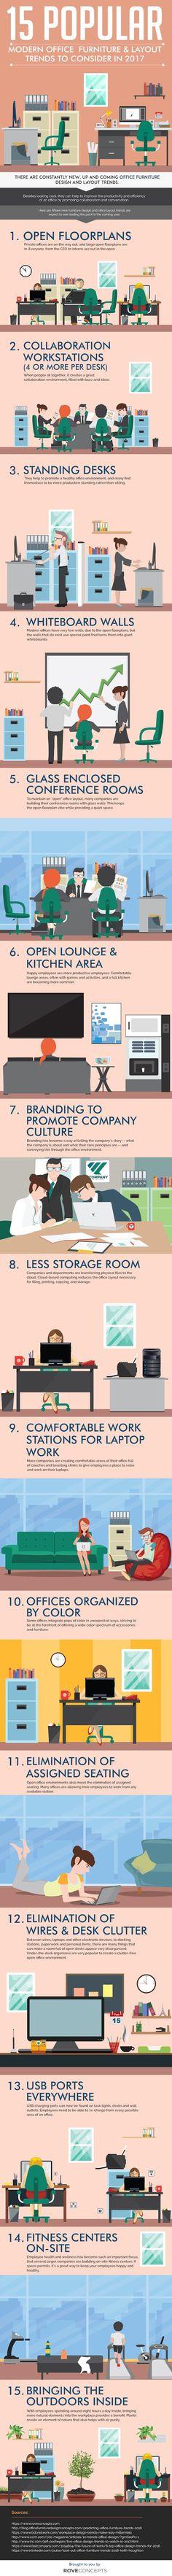 best pink office decor images on pinterest work spaces desks